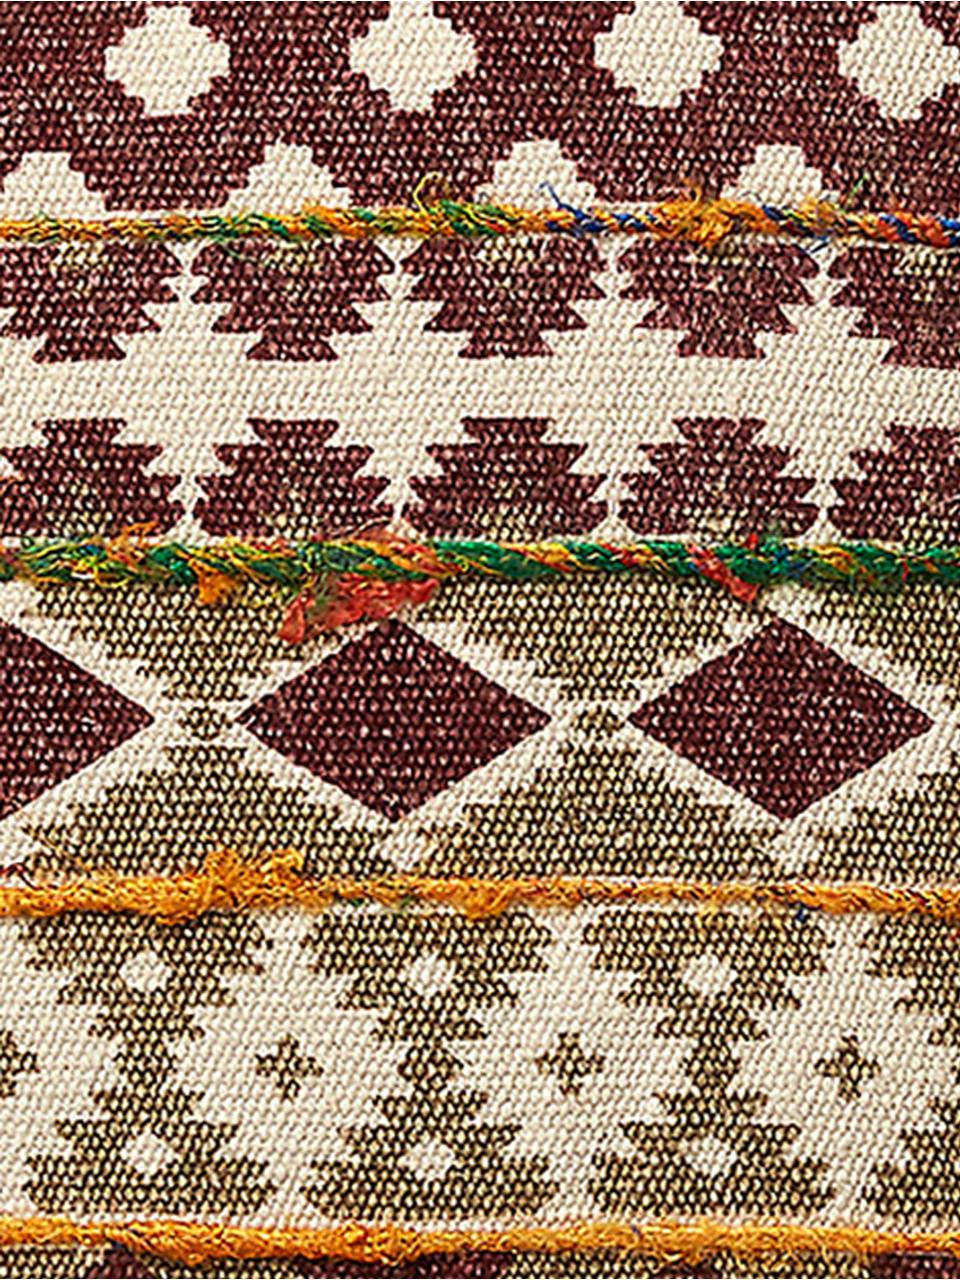 Federa arredo ricamata con nappe Mahesana, 100% cotone, Beige, rosso, giallo, verde, Larg. 45 x Lung. 45 cm